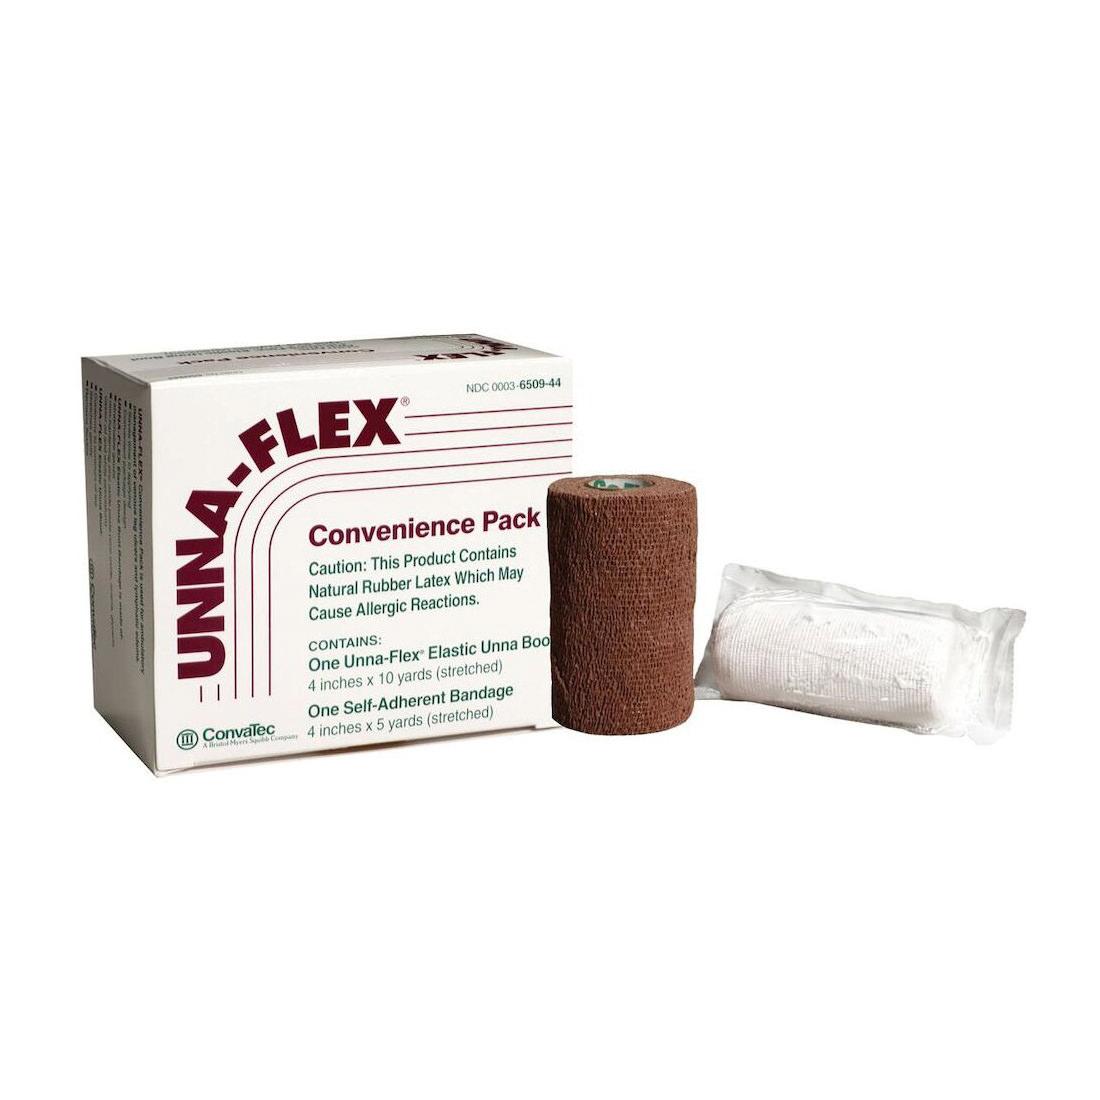 "ConvaTec Unna-FLEx Bandage Convenience Pack 4"" x 10 yards Unna Boot"